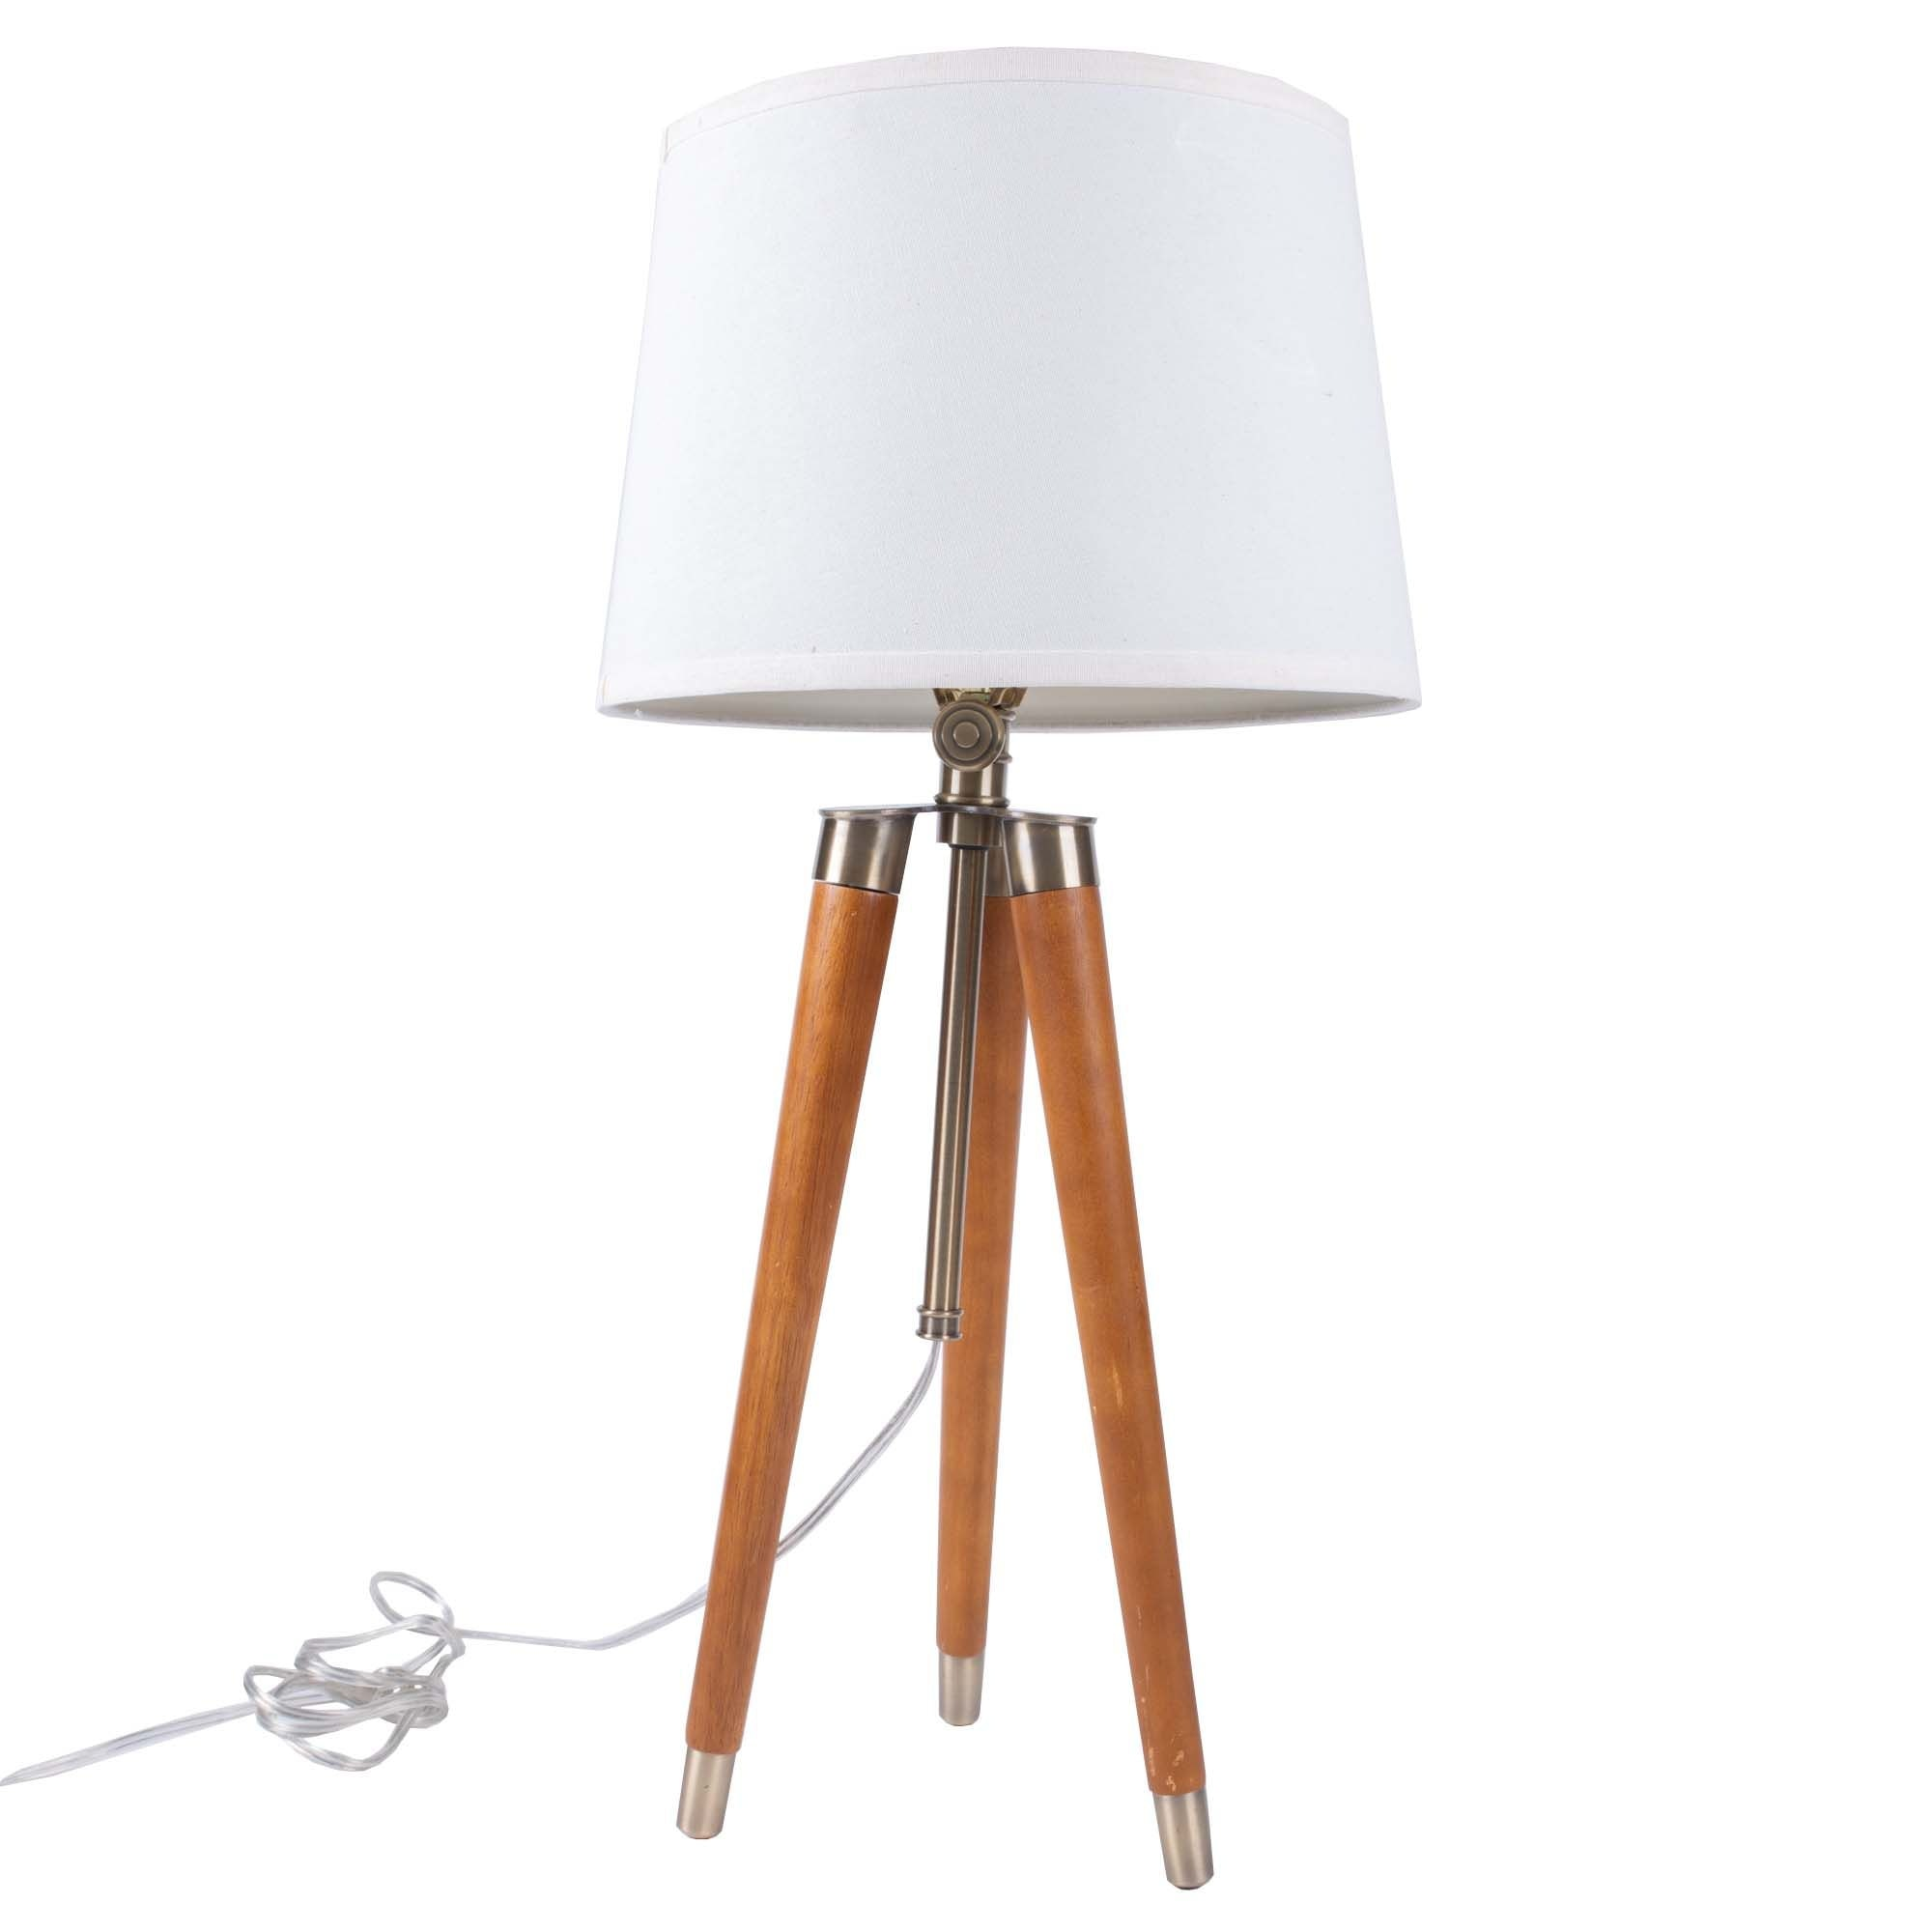 Mid Century Modern Wooden Tripod Table Lamp Ebth